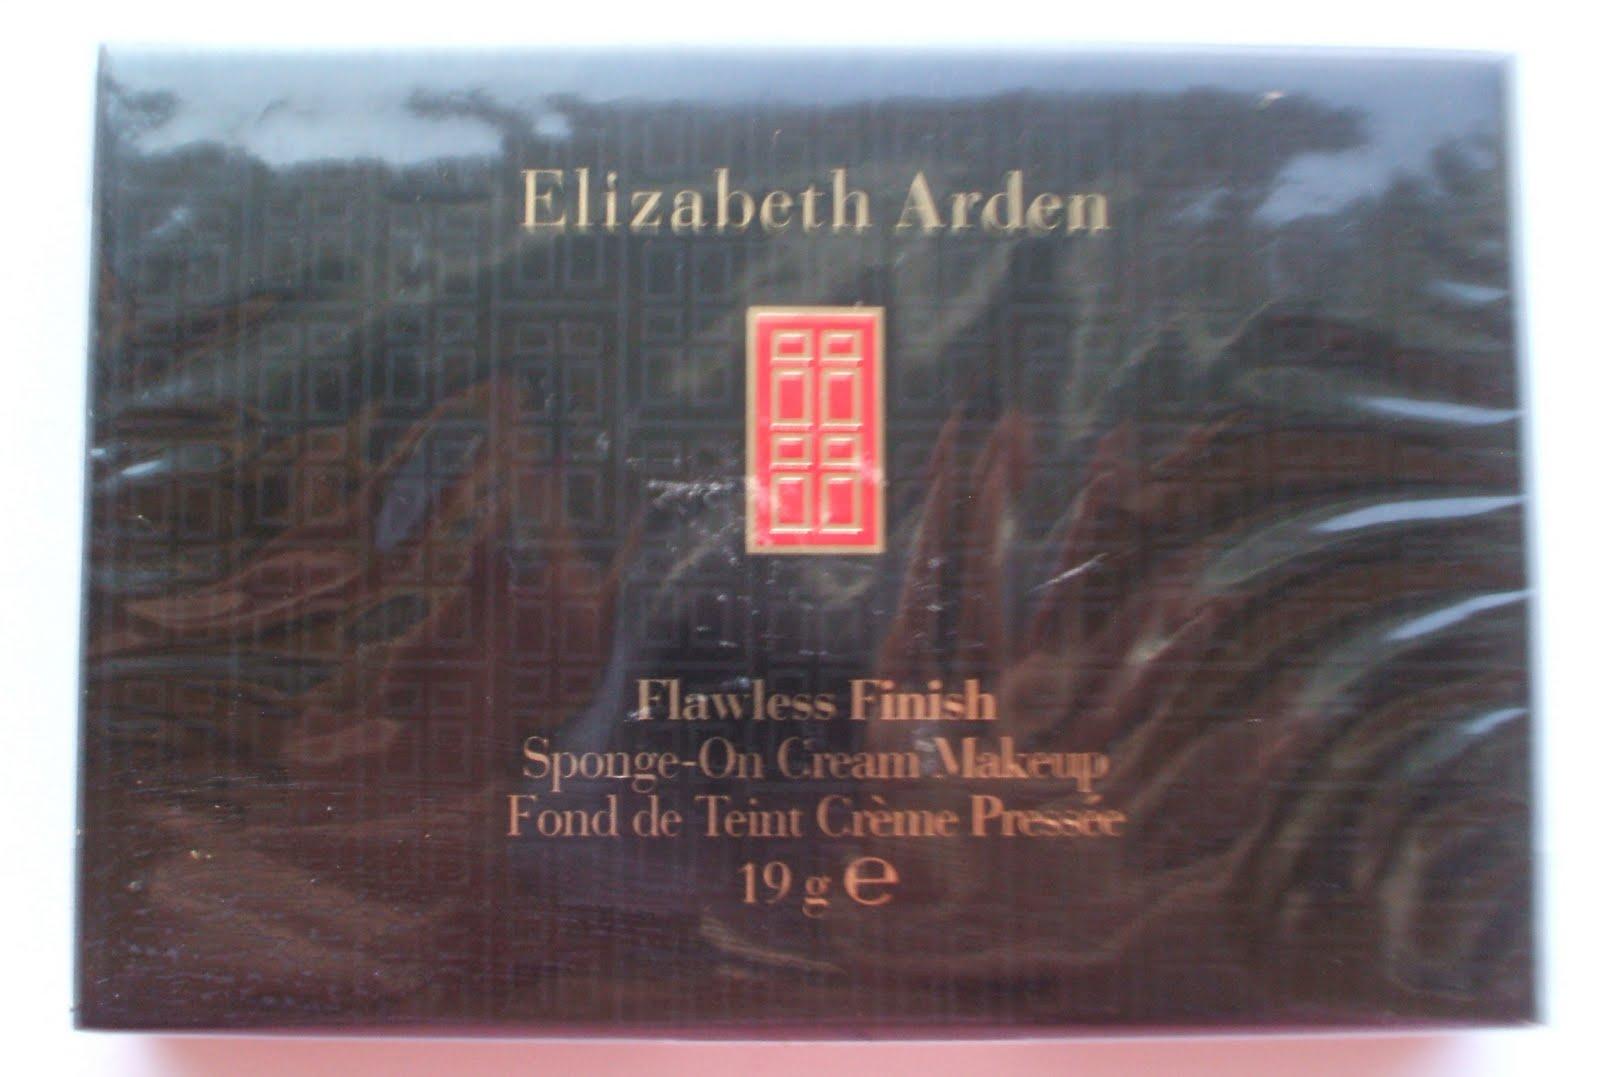 Definitelybeauty Elizabeth Arden Flawless Finish Compact